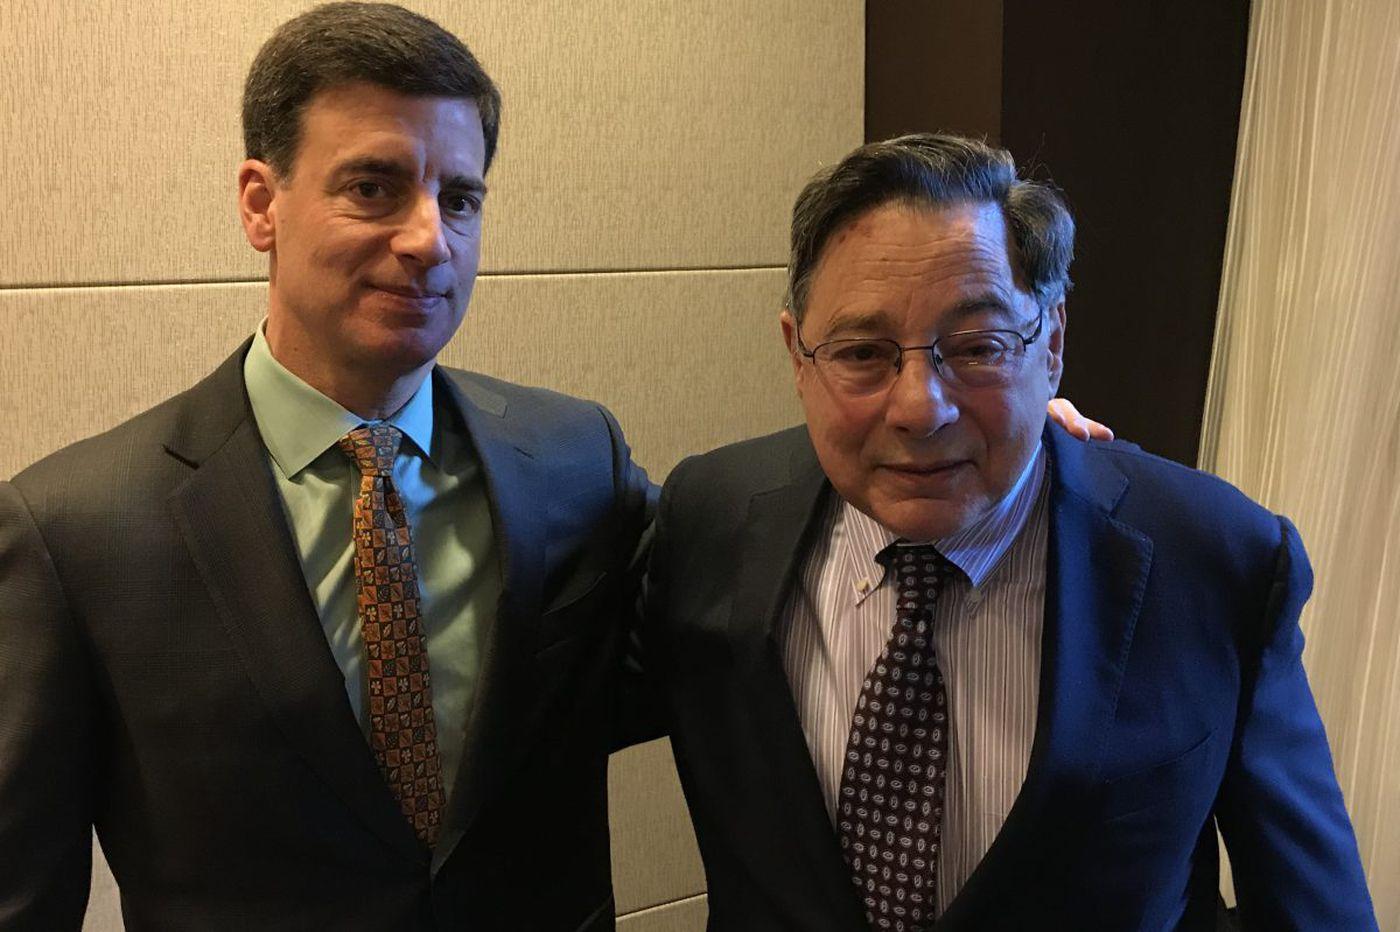 Entercom-CBS Radio merger passes another milestone with shareholder vote